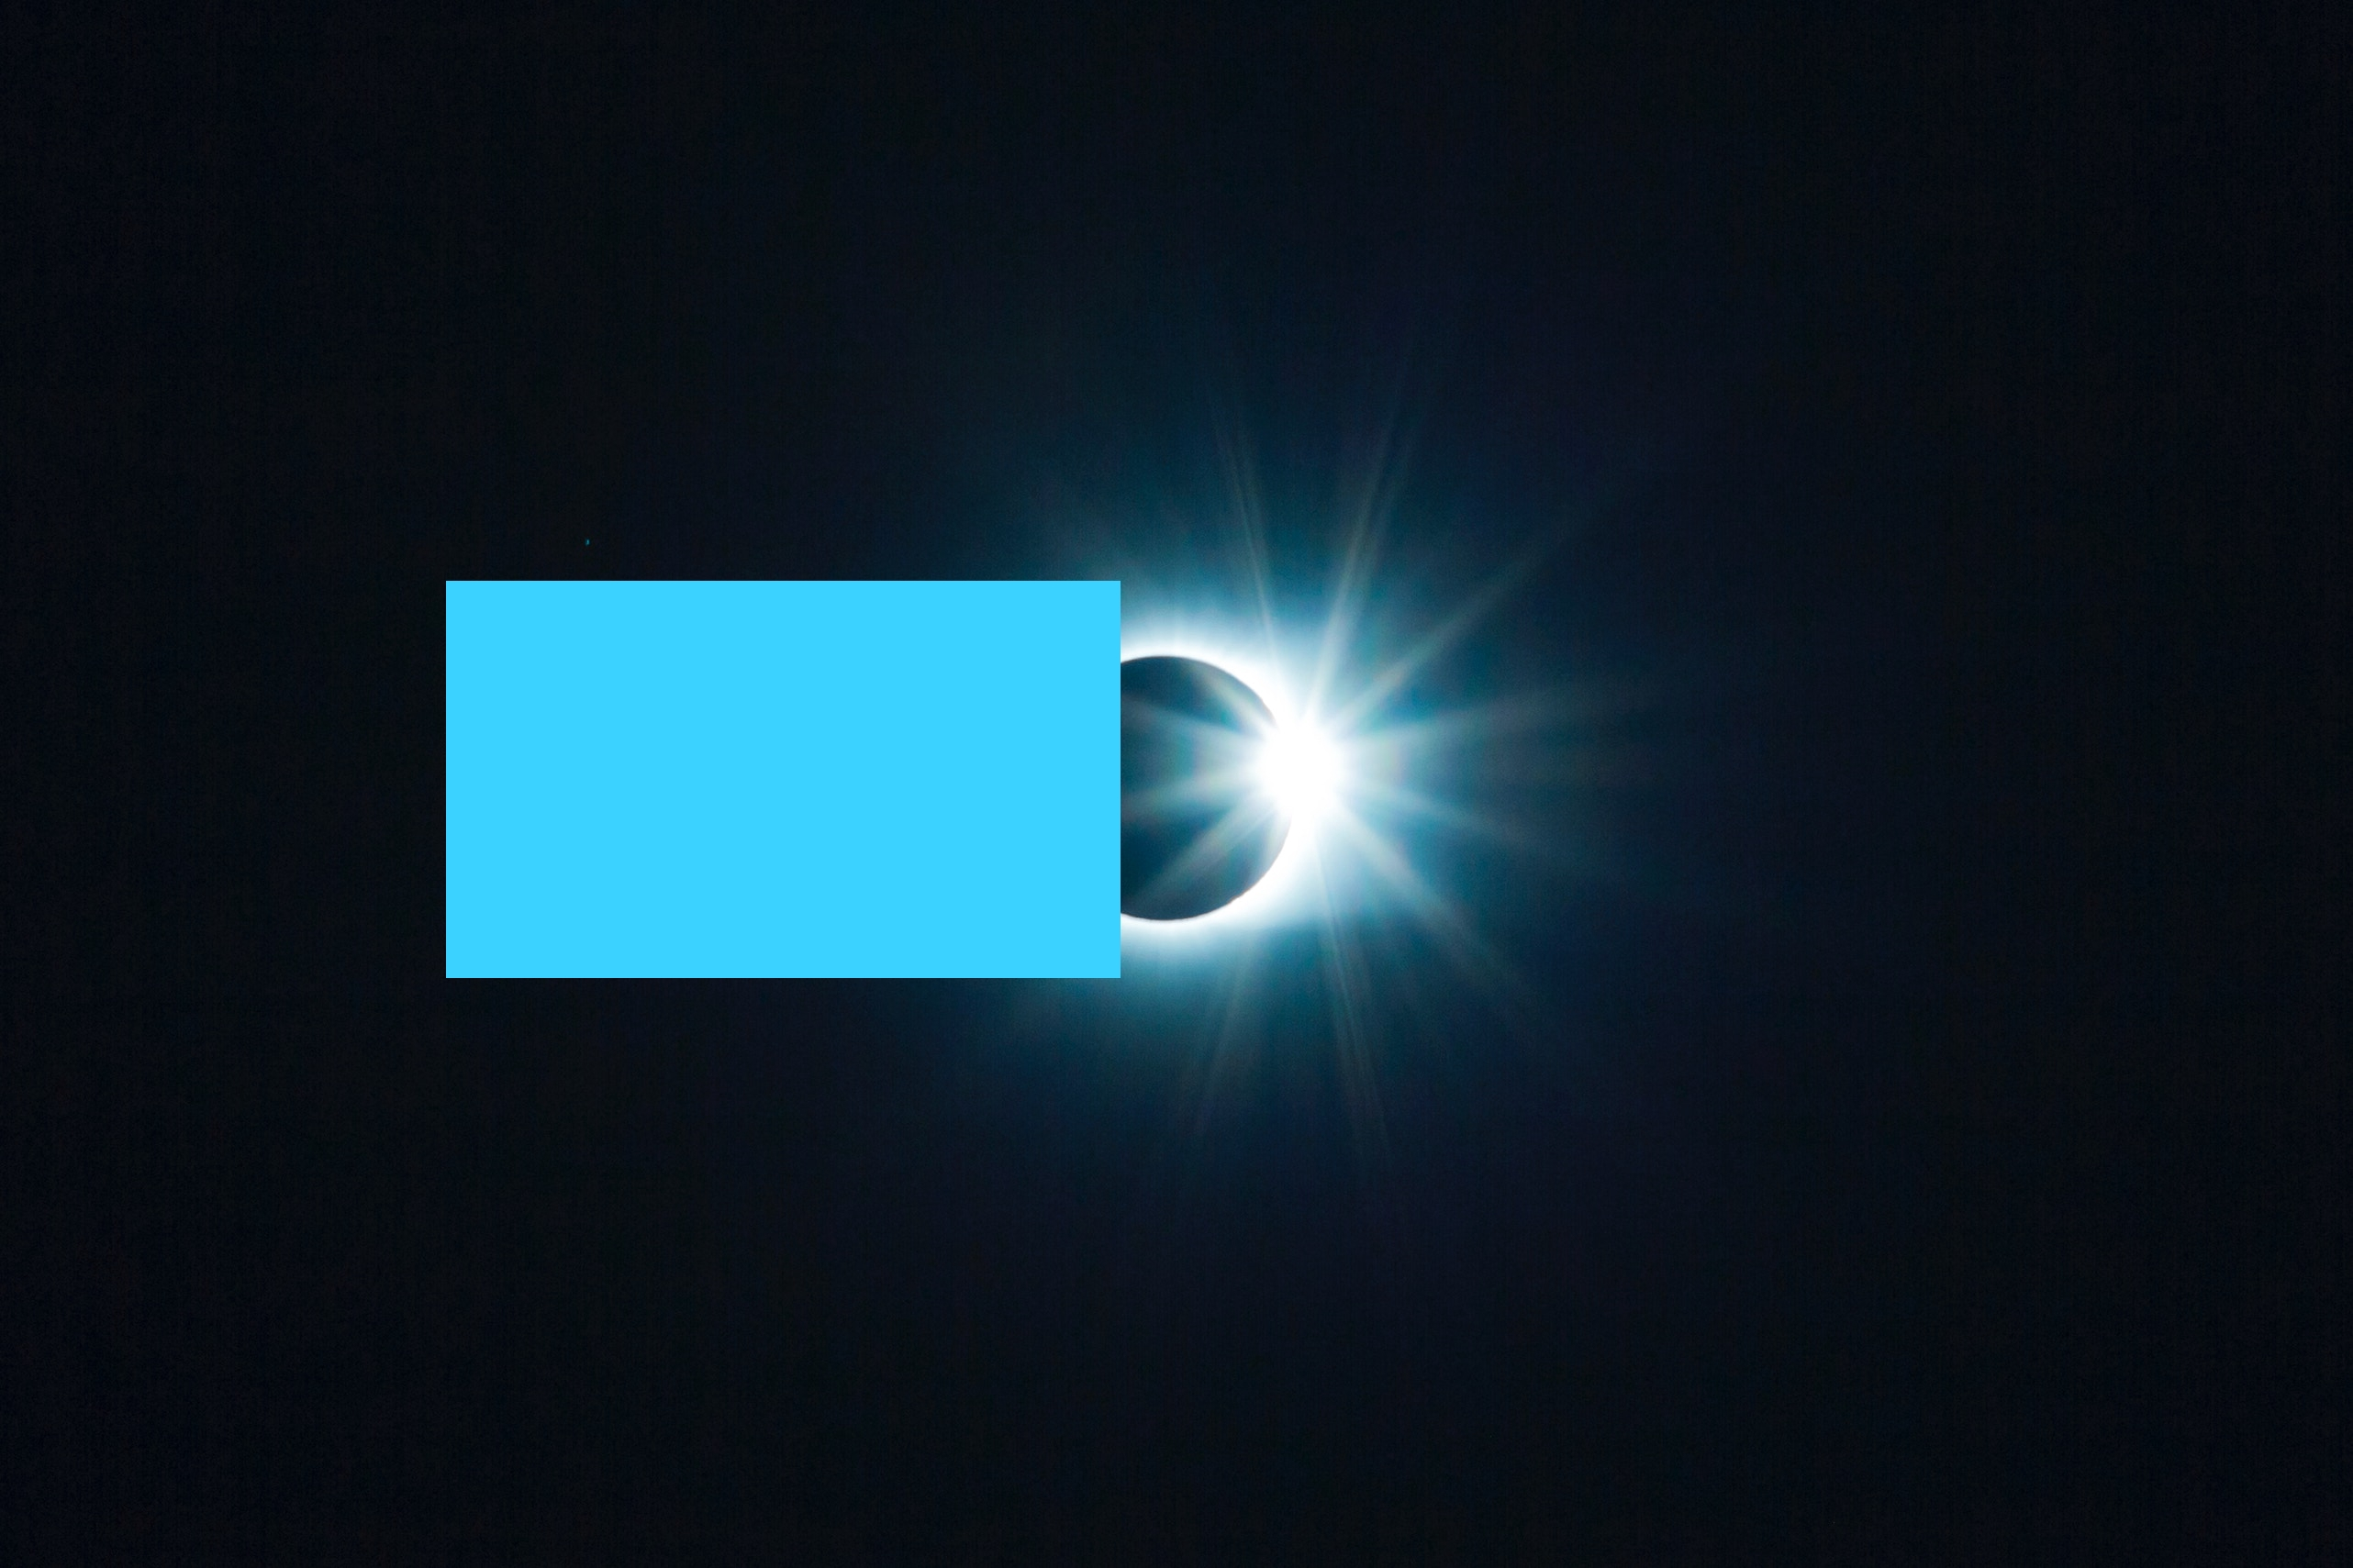 A zima-blue entry